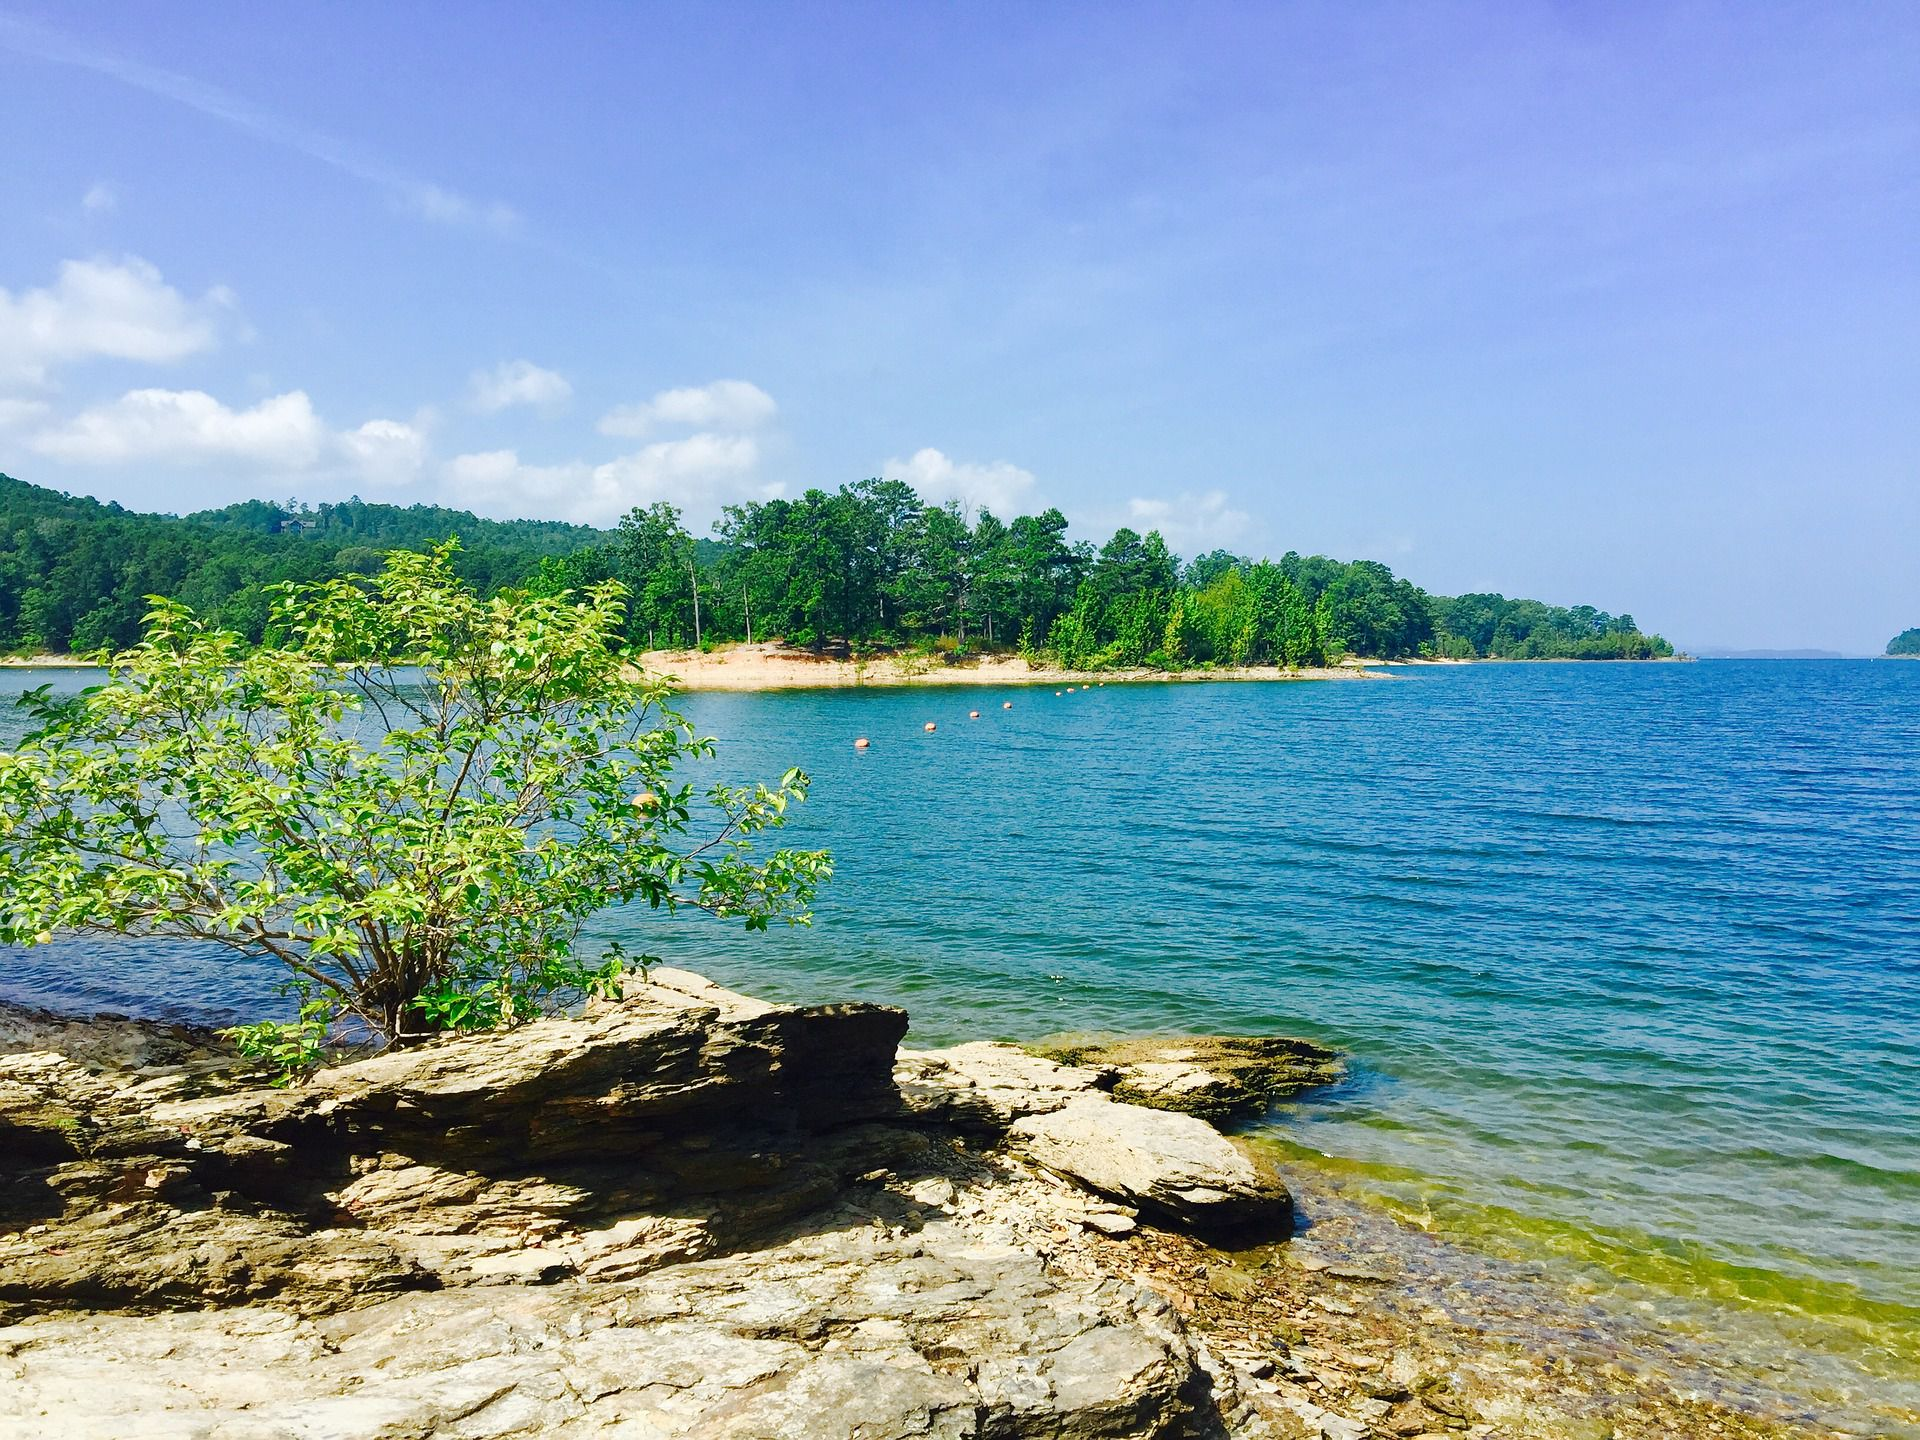 Beautiful Lake Ouachita State Park in Arkansas